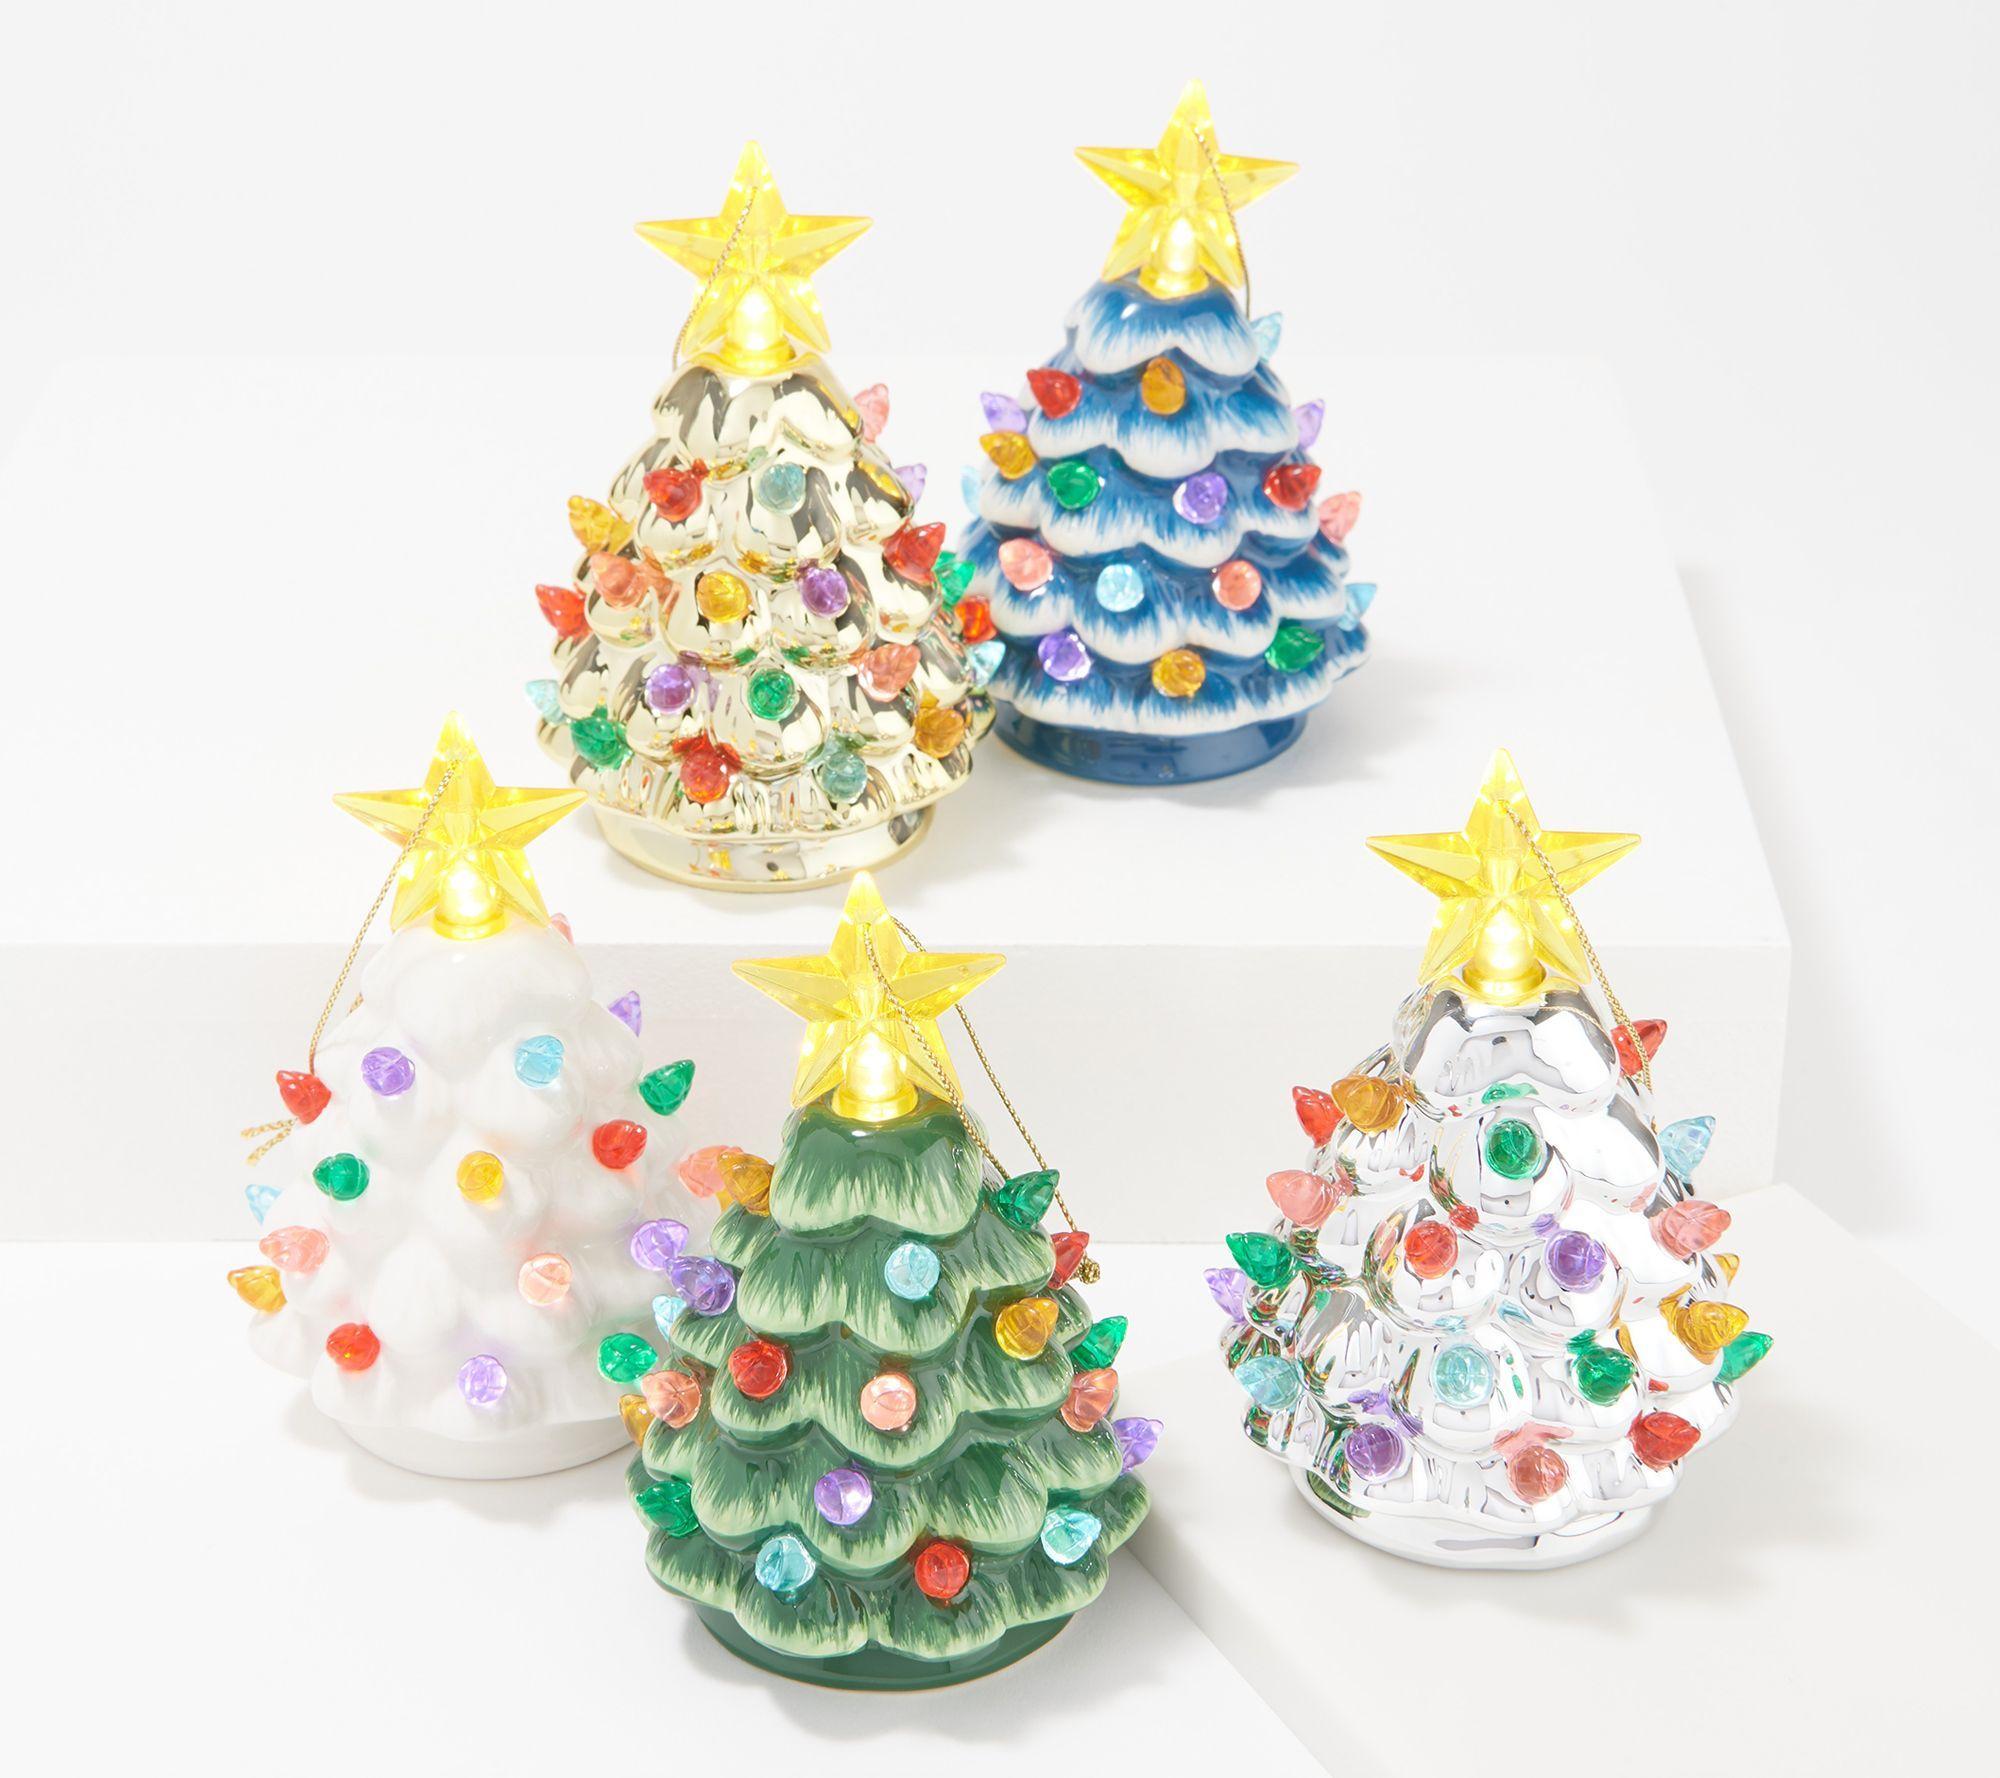 Mr Christmas Set Of 5 4 5 Mini Nostalgic Trees With Gift Bags Qvc Com In 2020 Christmas Settings Mini Christmas Tree Vintage Christmas Decorations